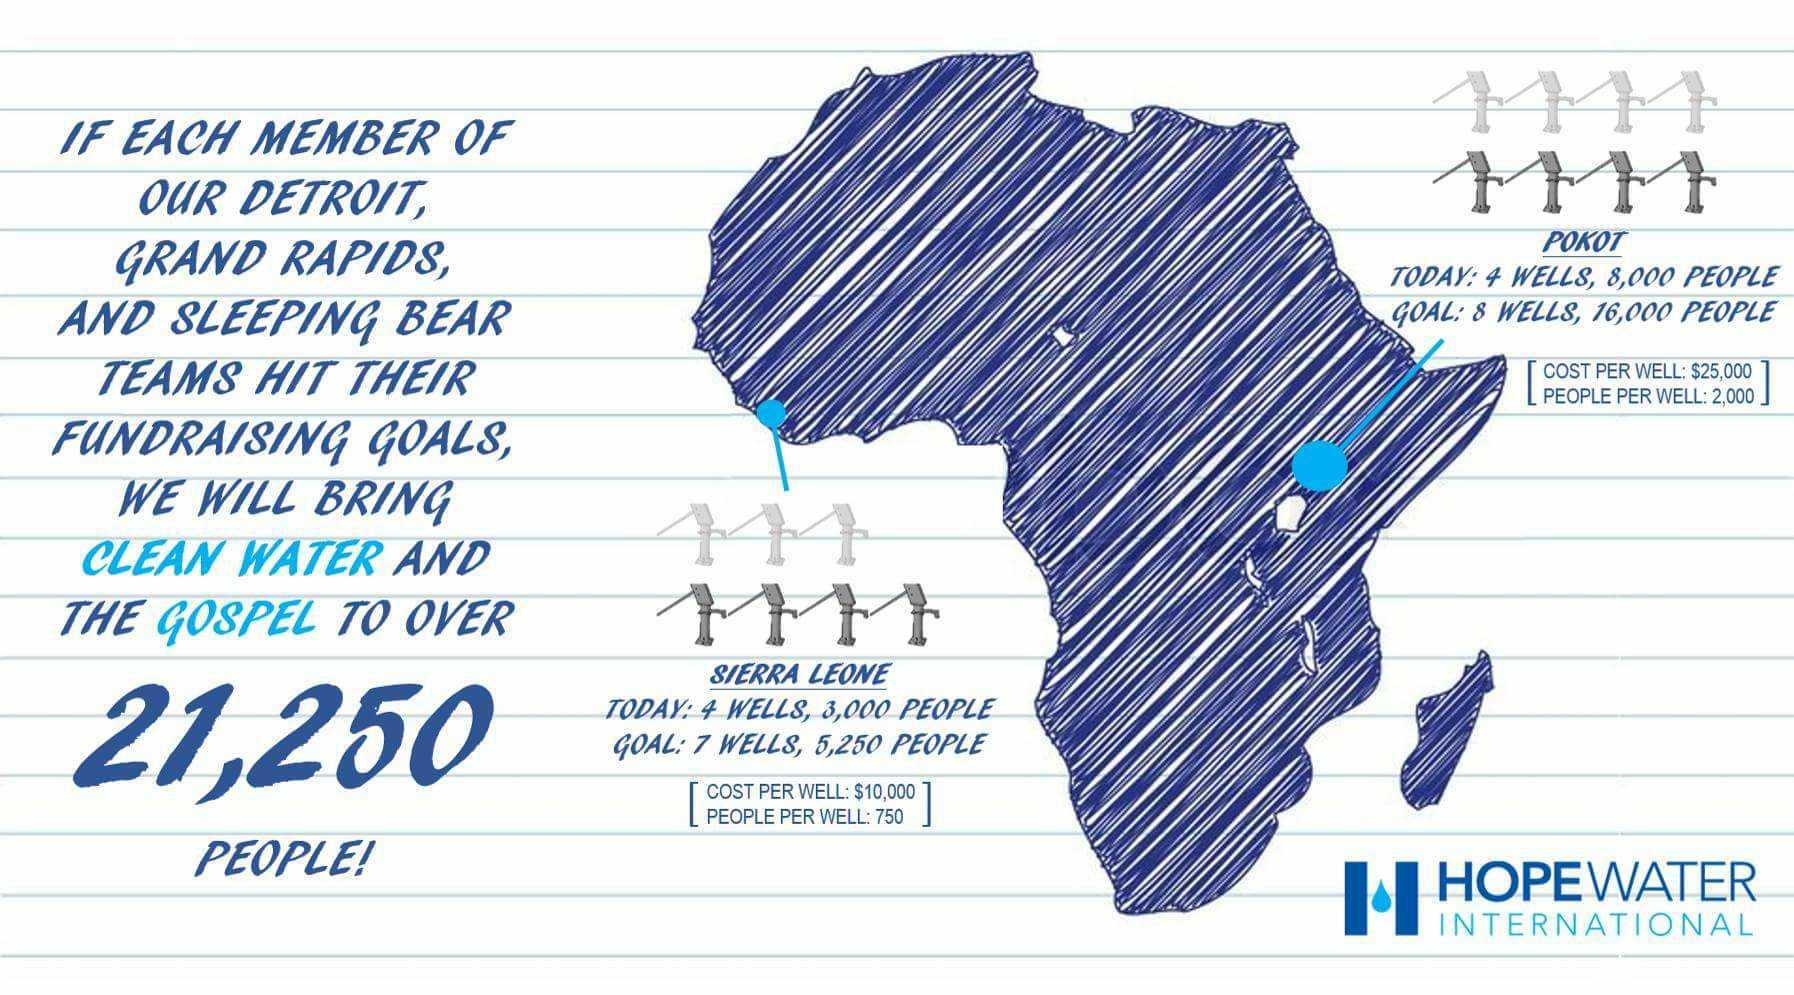 Helping Bring Clean Water to 21,250 People